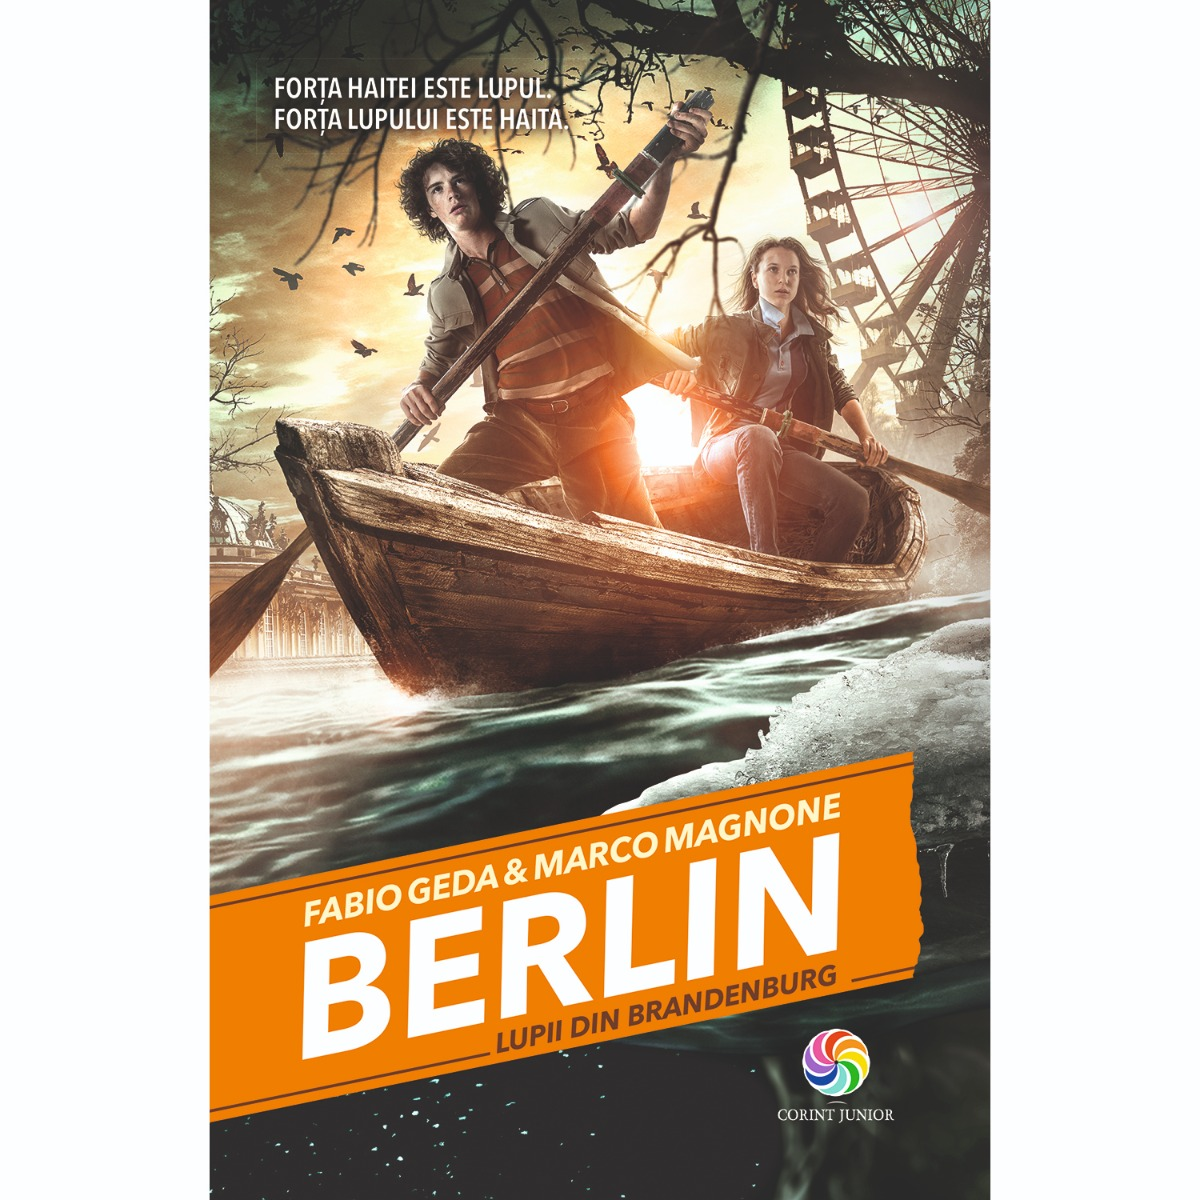 Carte Editura Corint, Berlin vol.IV Lupii din Brandenburg, Fabio Geda, Marco Magnone